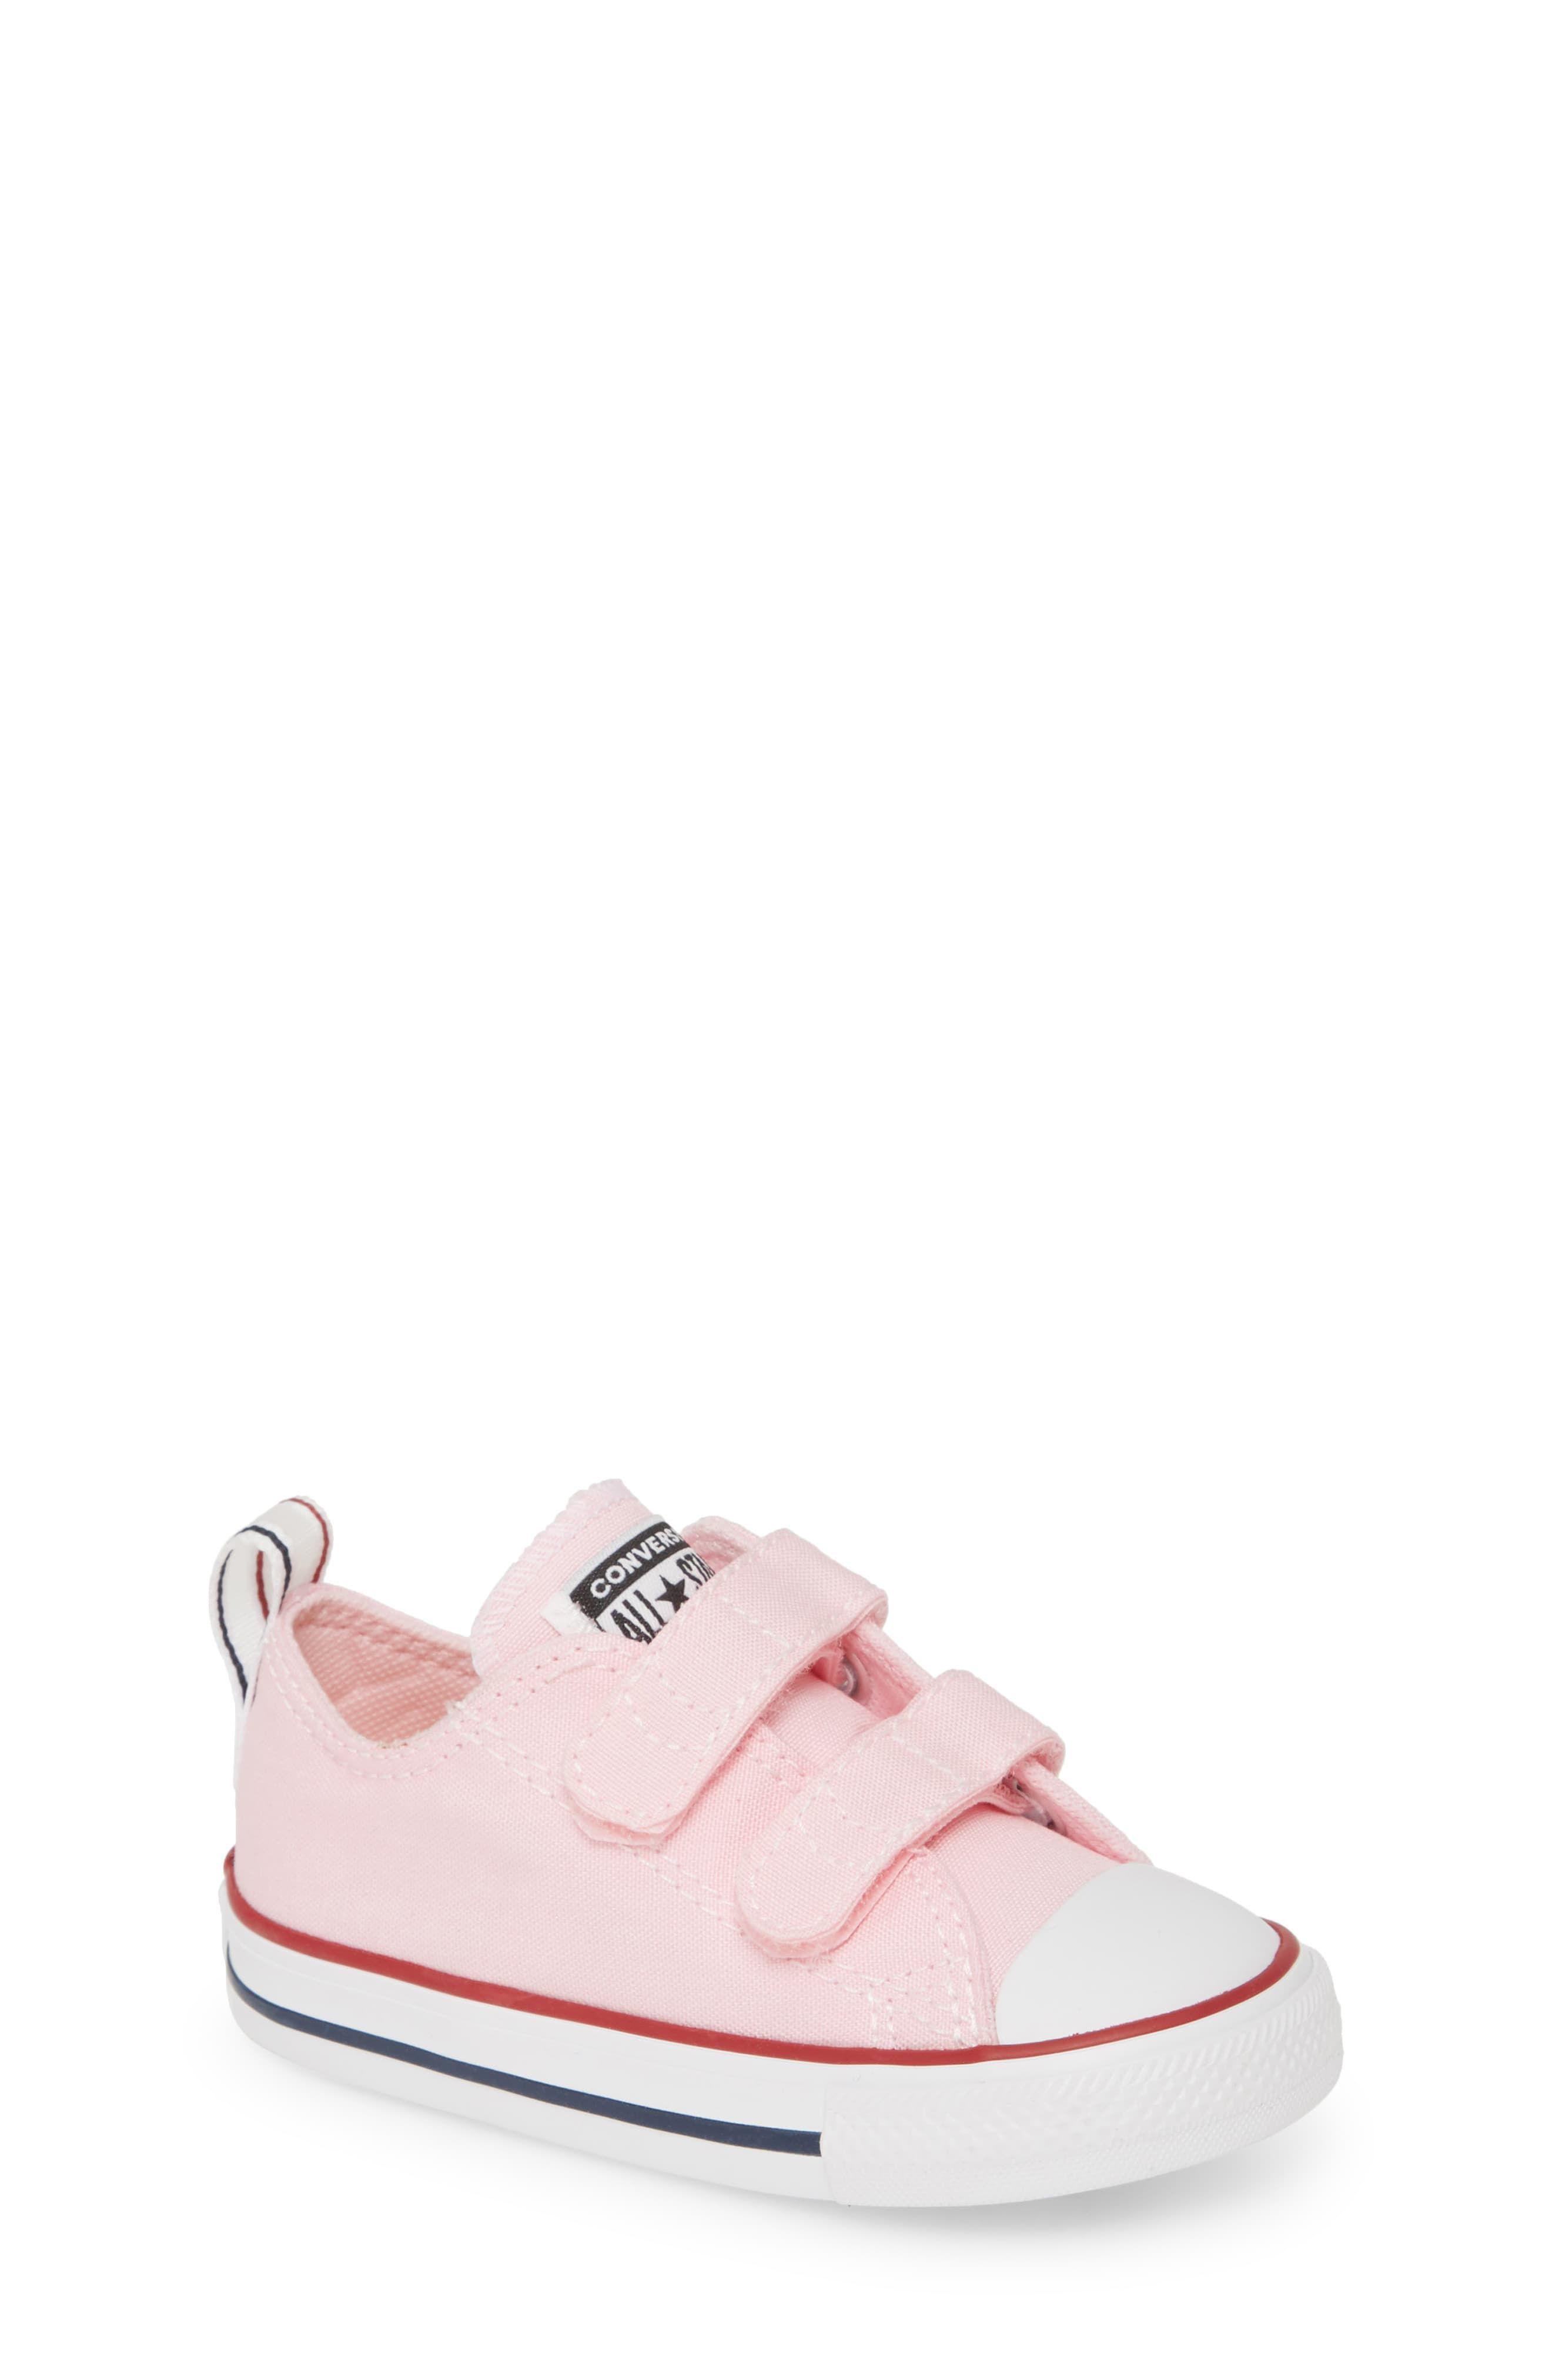 Converse Chuck Taylor® Low Top Sneaker (Baby, Walker